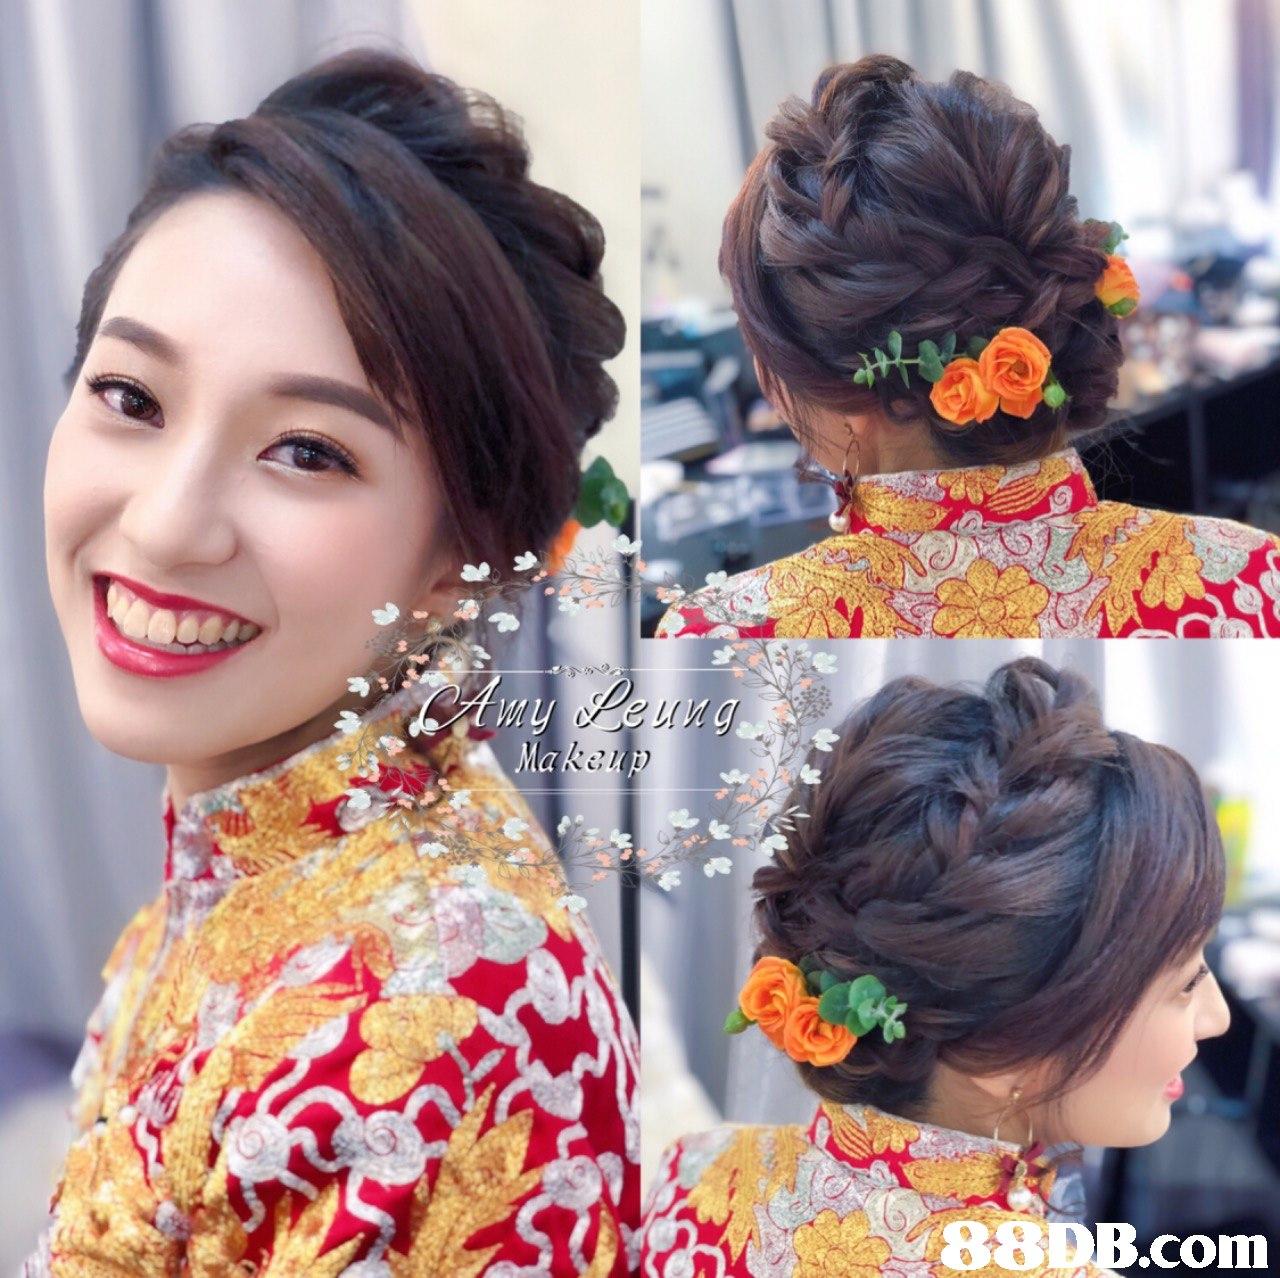 Ma 88B.com  hair,hairstyle,fashion accessory,bride,tradition